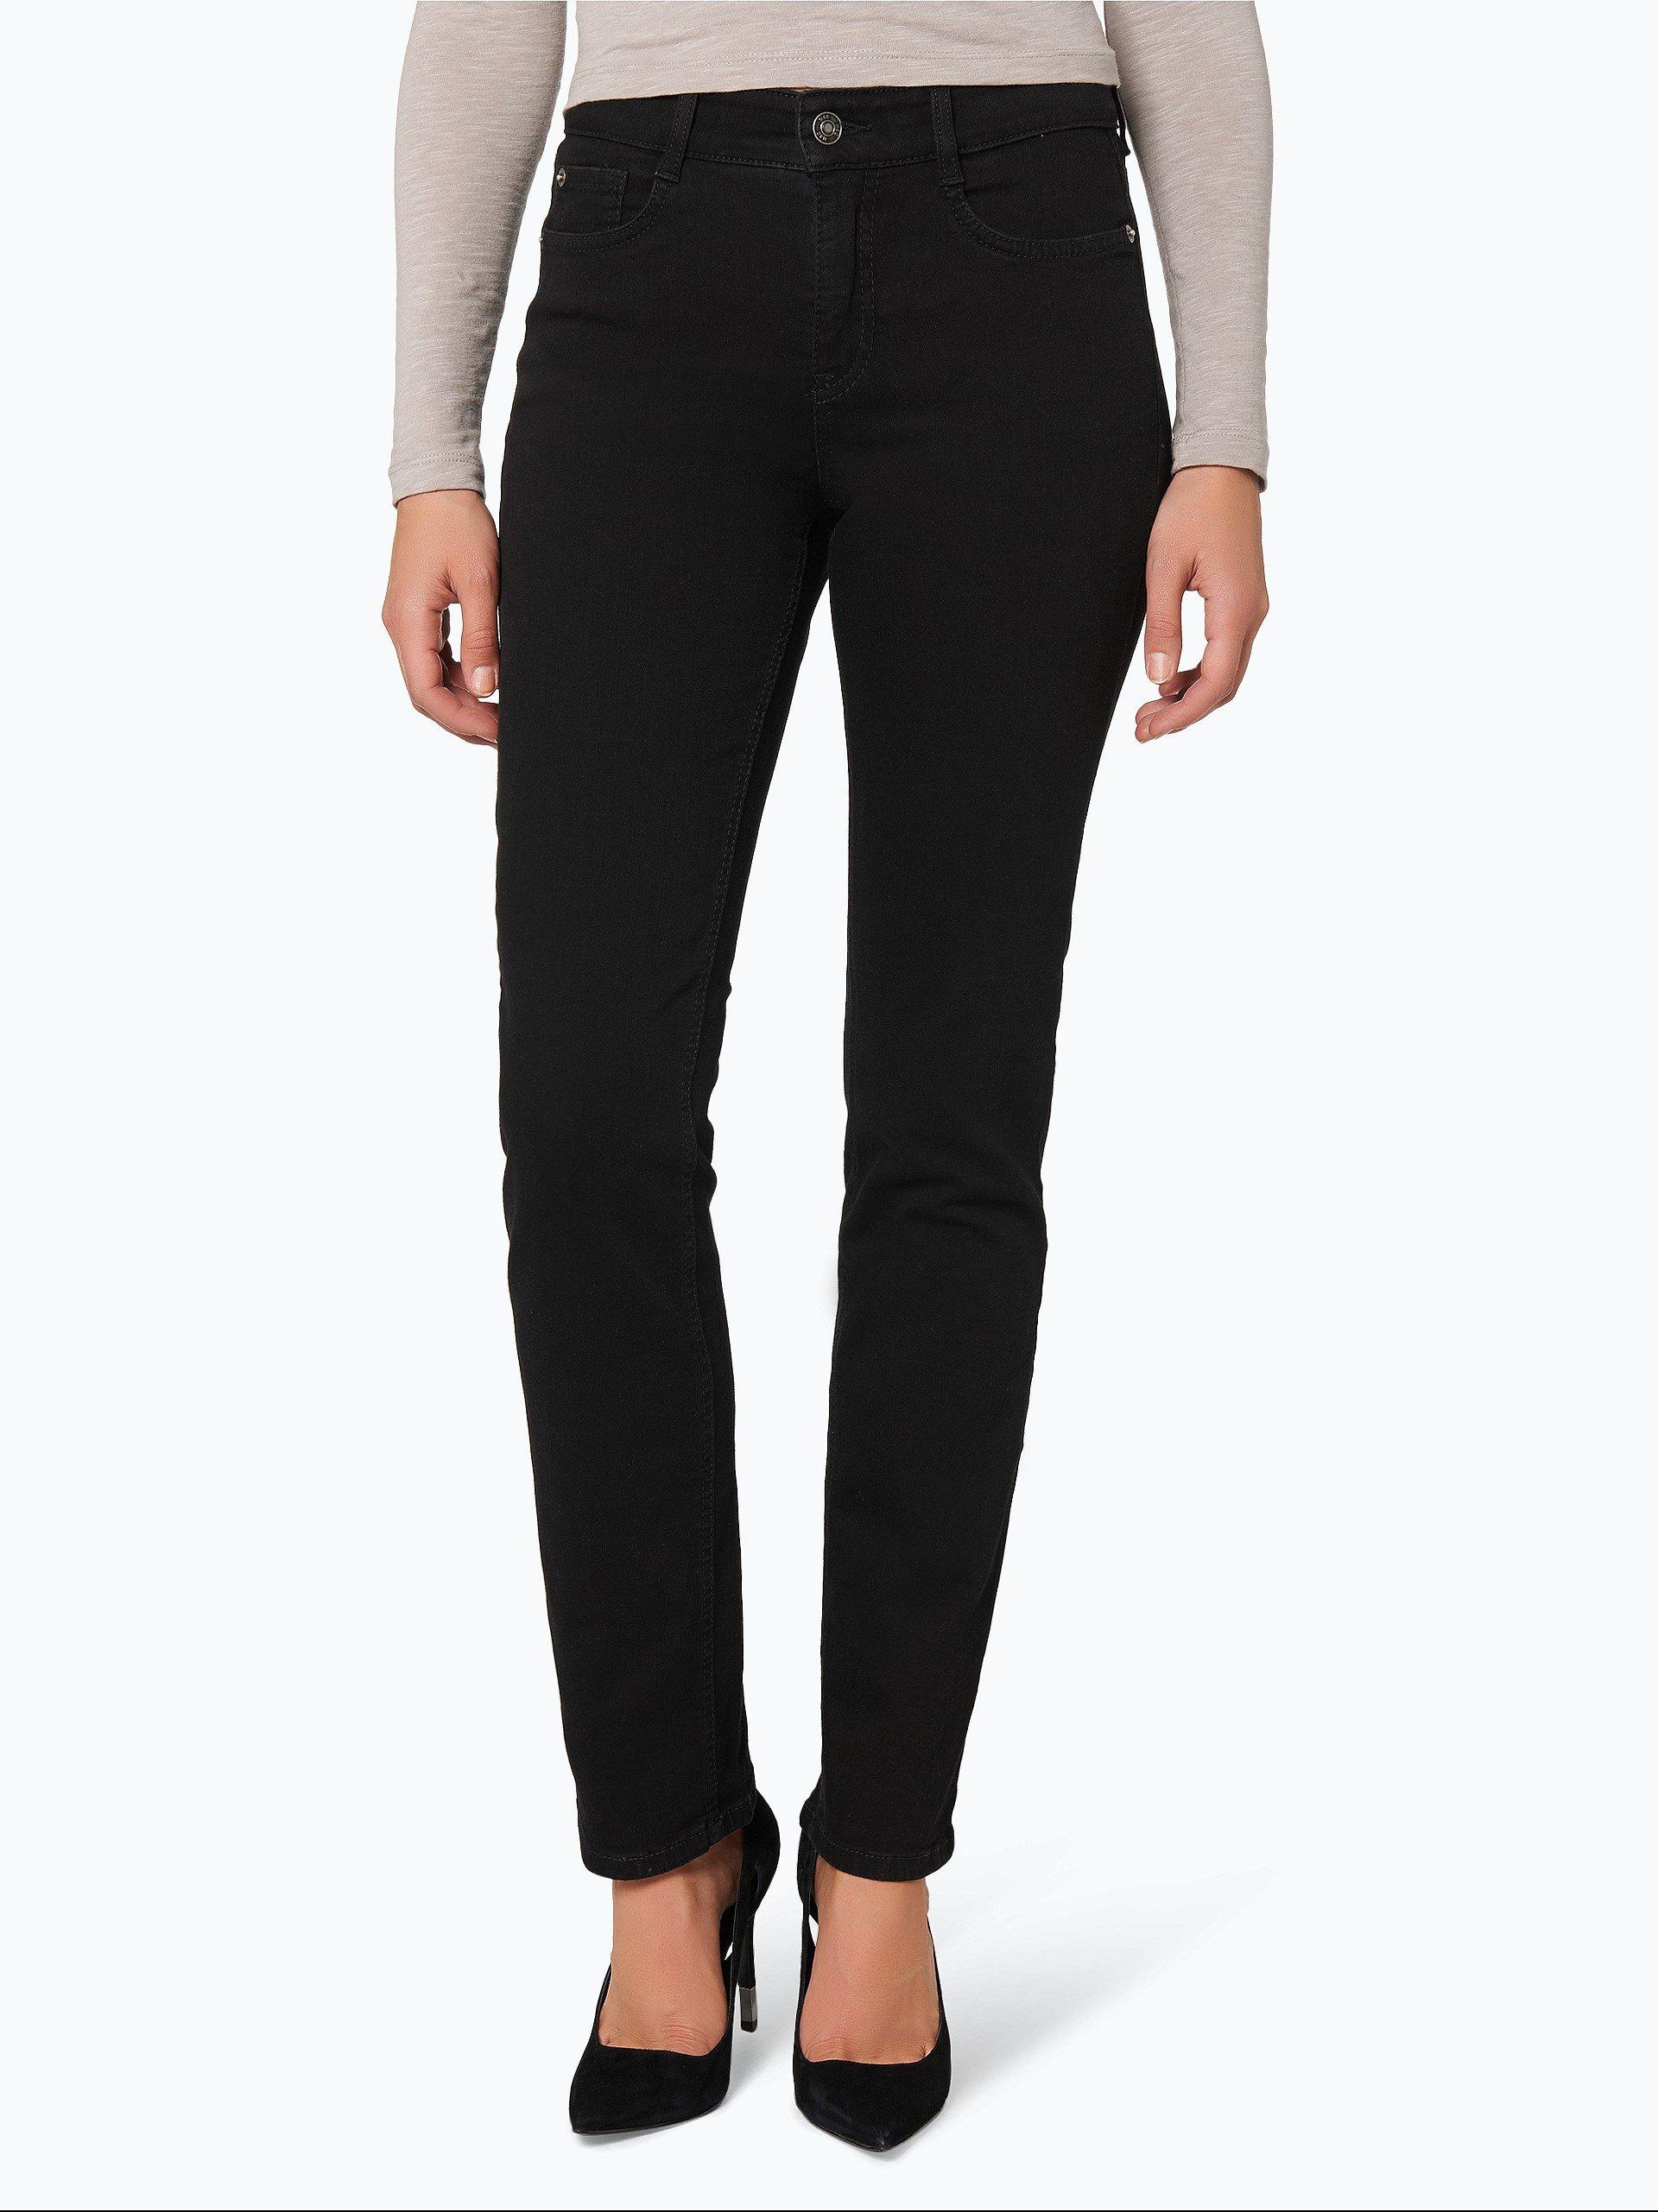 mac damen jeans angela schwarz uni online kaufen peek. Black Bedroom Furniture Sets. Home Design Ideas